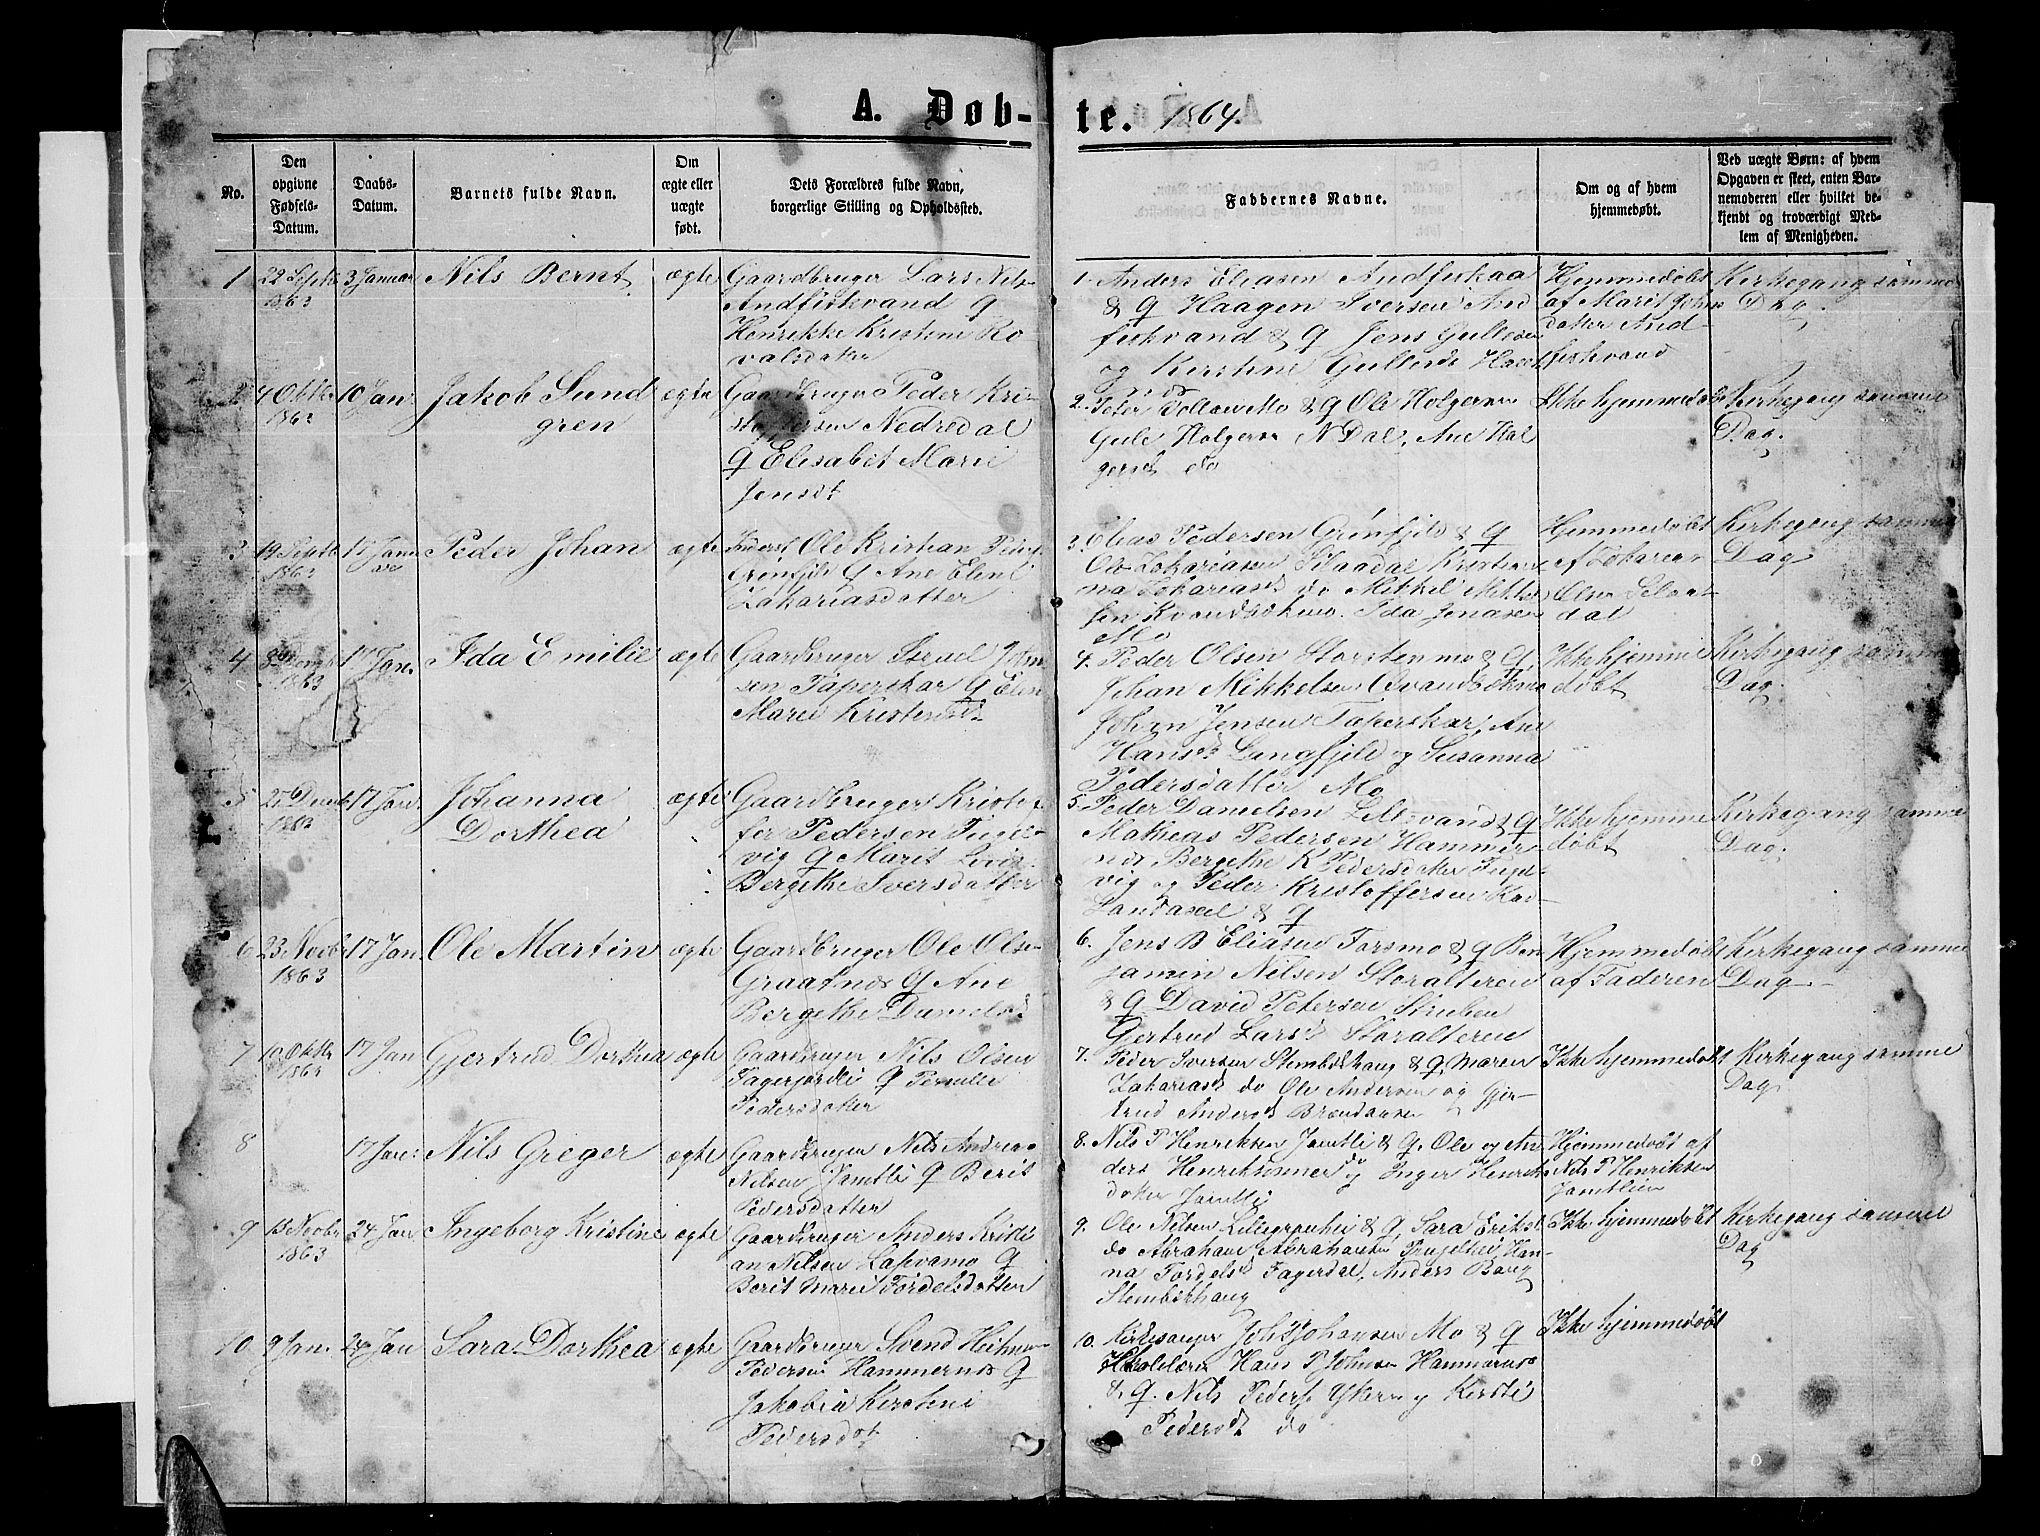 SAT, Ministerialprotokoller, klokkerbøker og fødselsregistre - Nordland, 827/L0415: Klokkerbok nr. 827C04, 1864-1886, s. 1